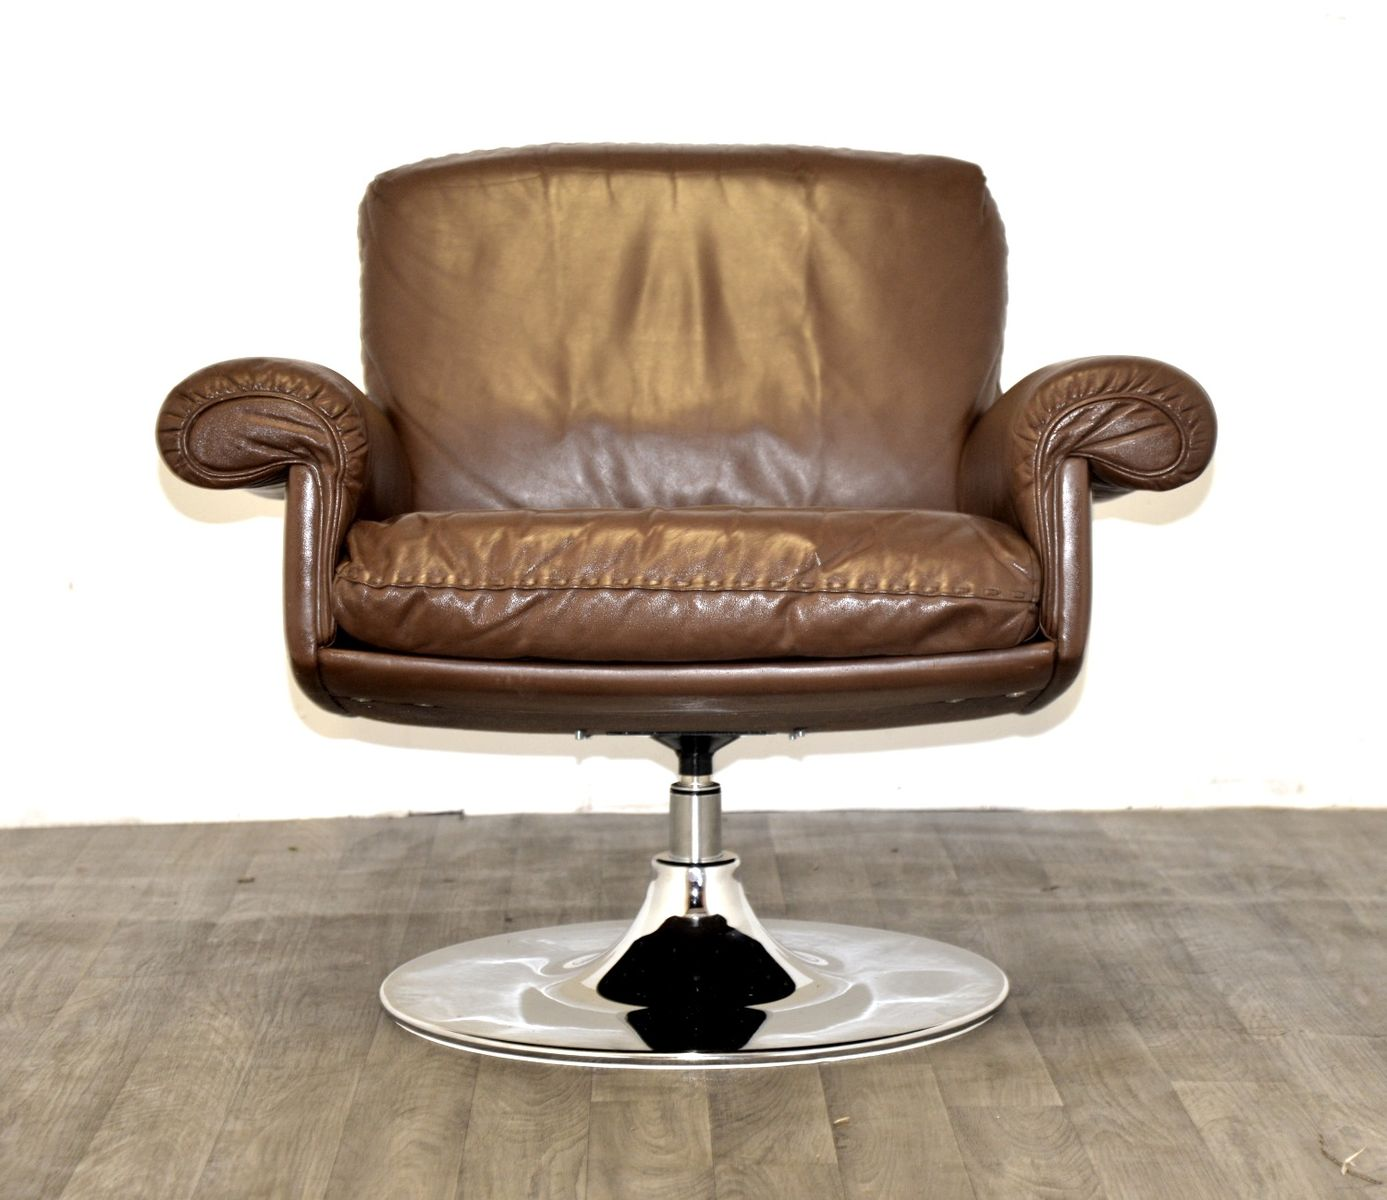 vintage ds 31 sessel von de sede bei pamono kaufen. Black Bedroom Furniture Sets. Home Design Ideas